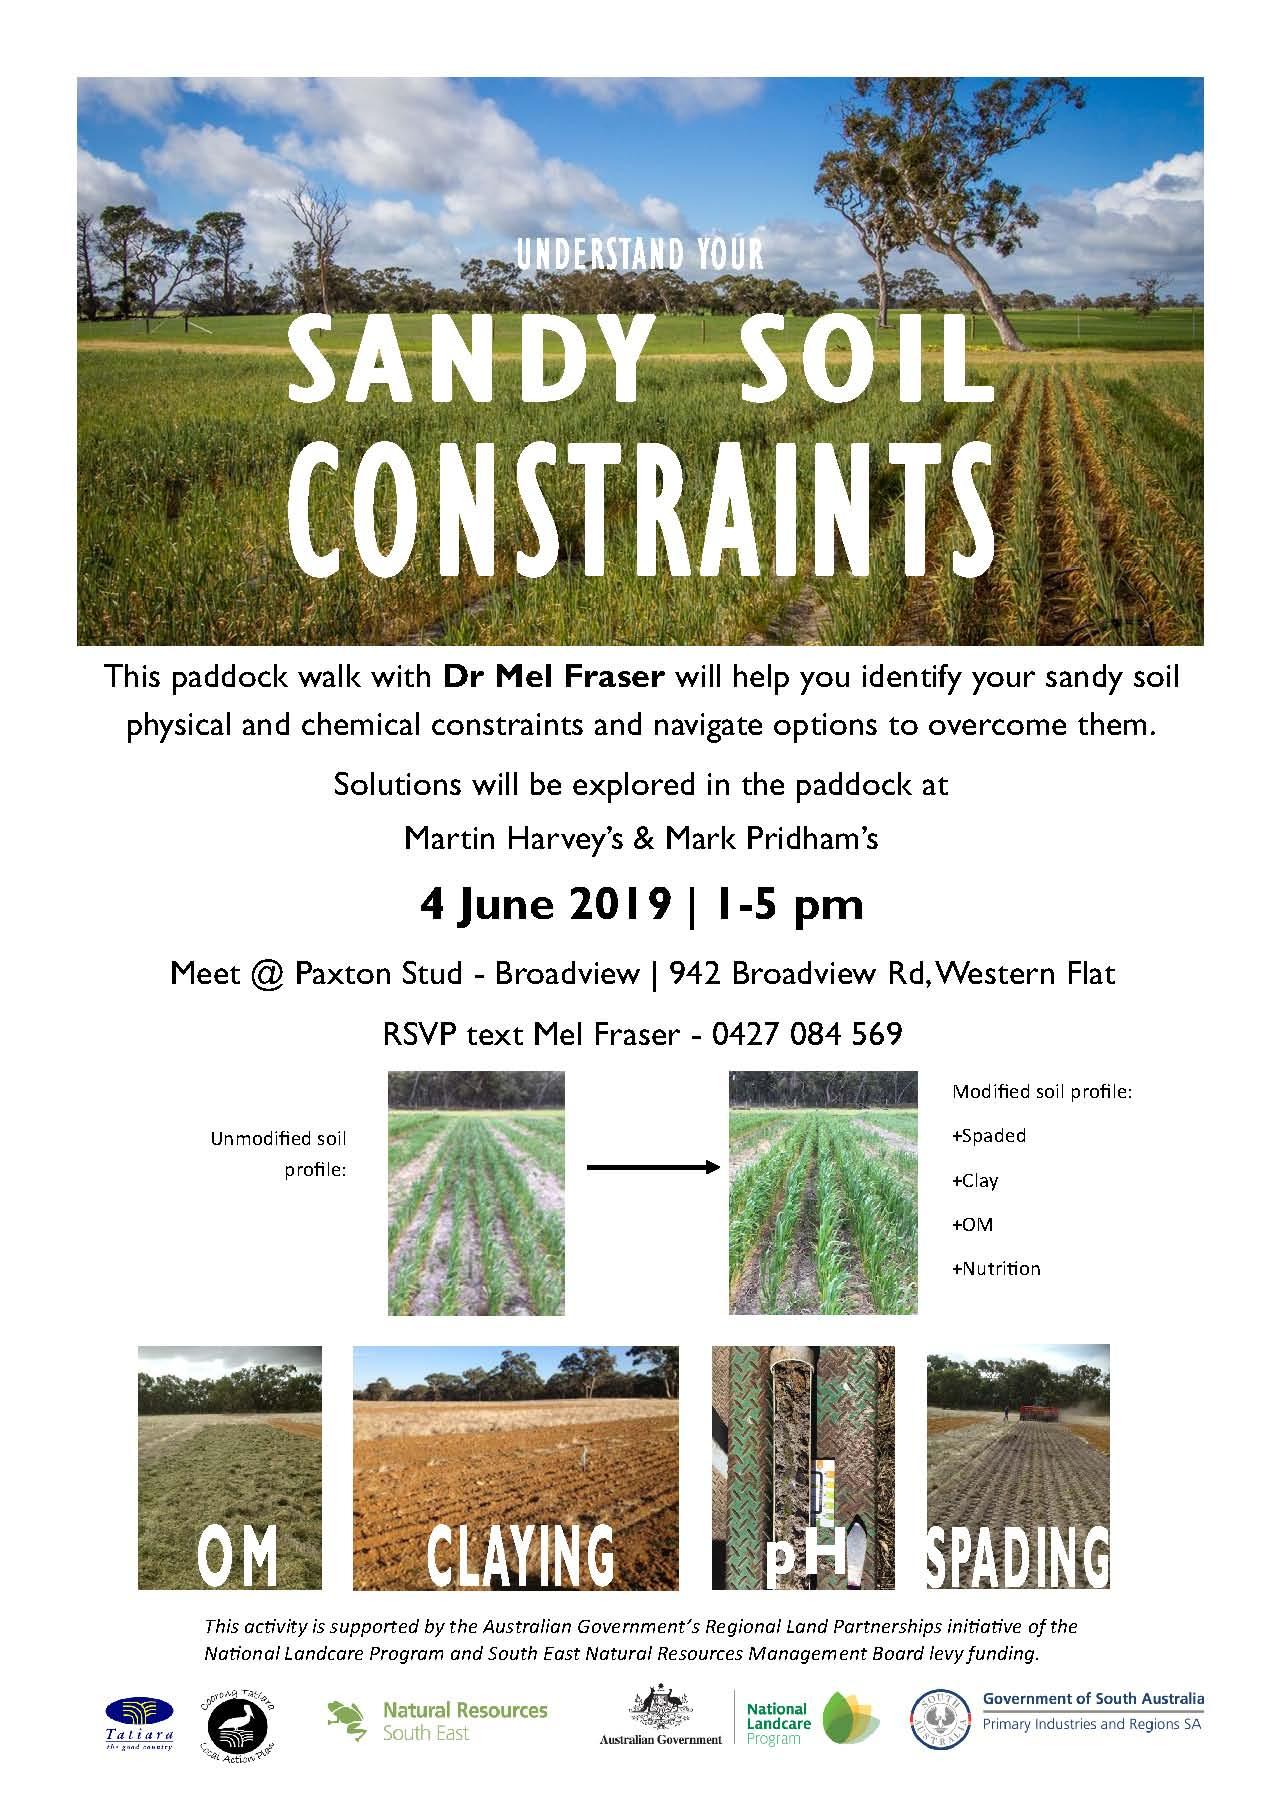 Tuesday 4th June_Sandy Soil Constraints_Western Flat